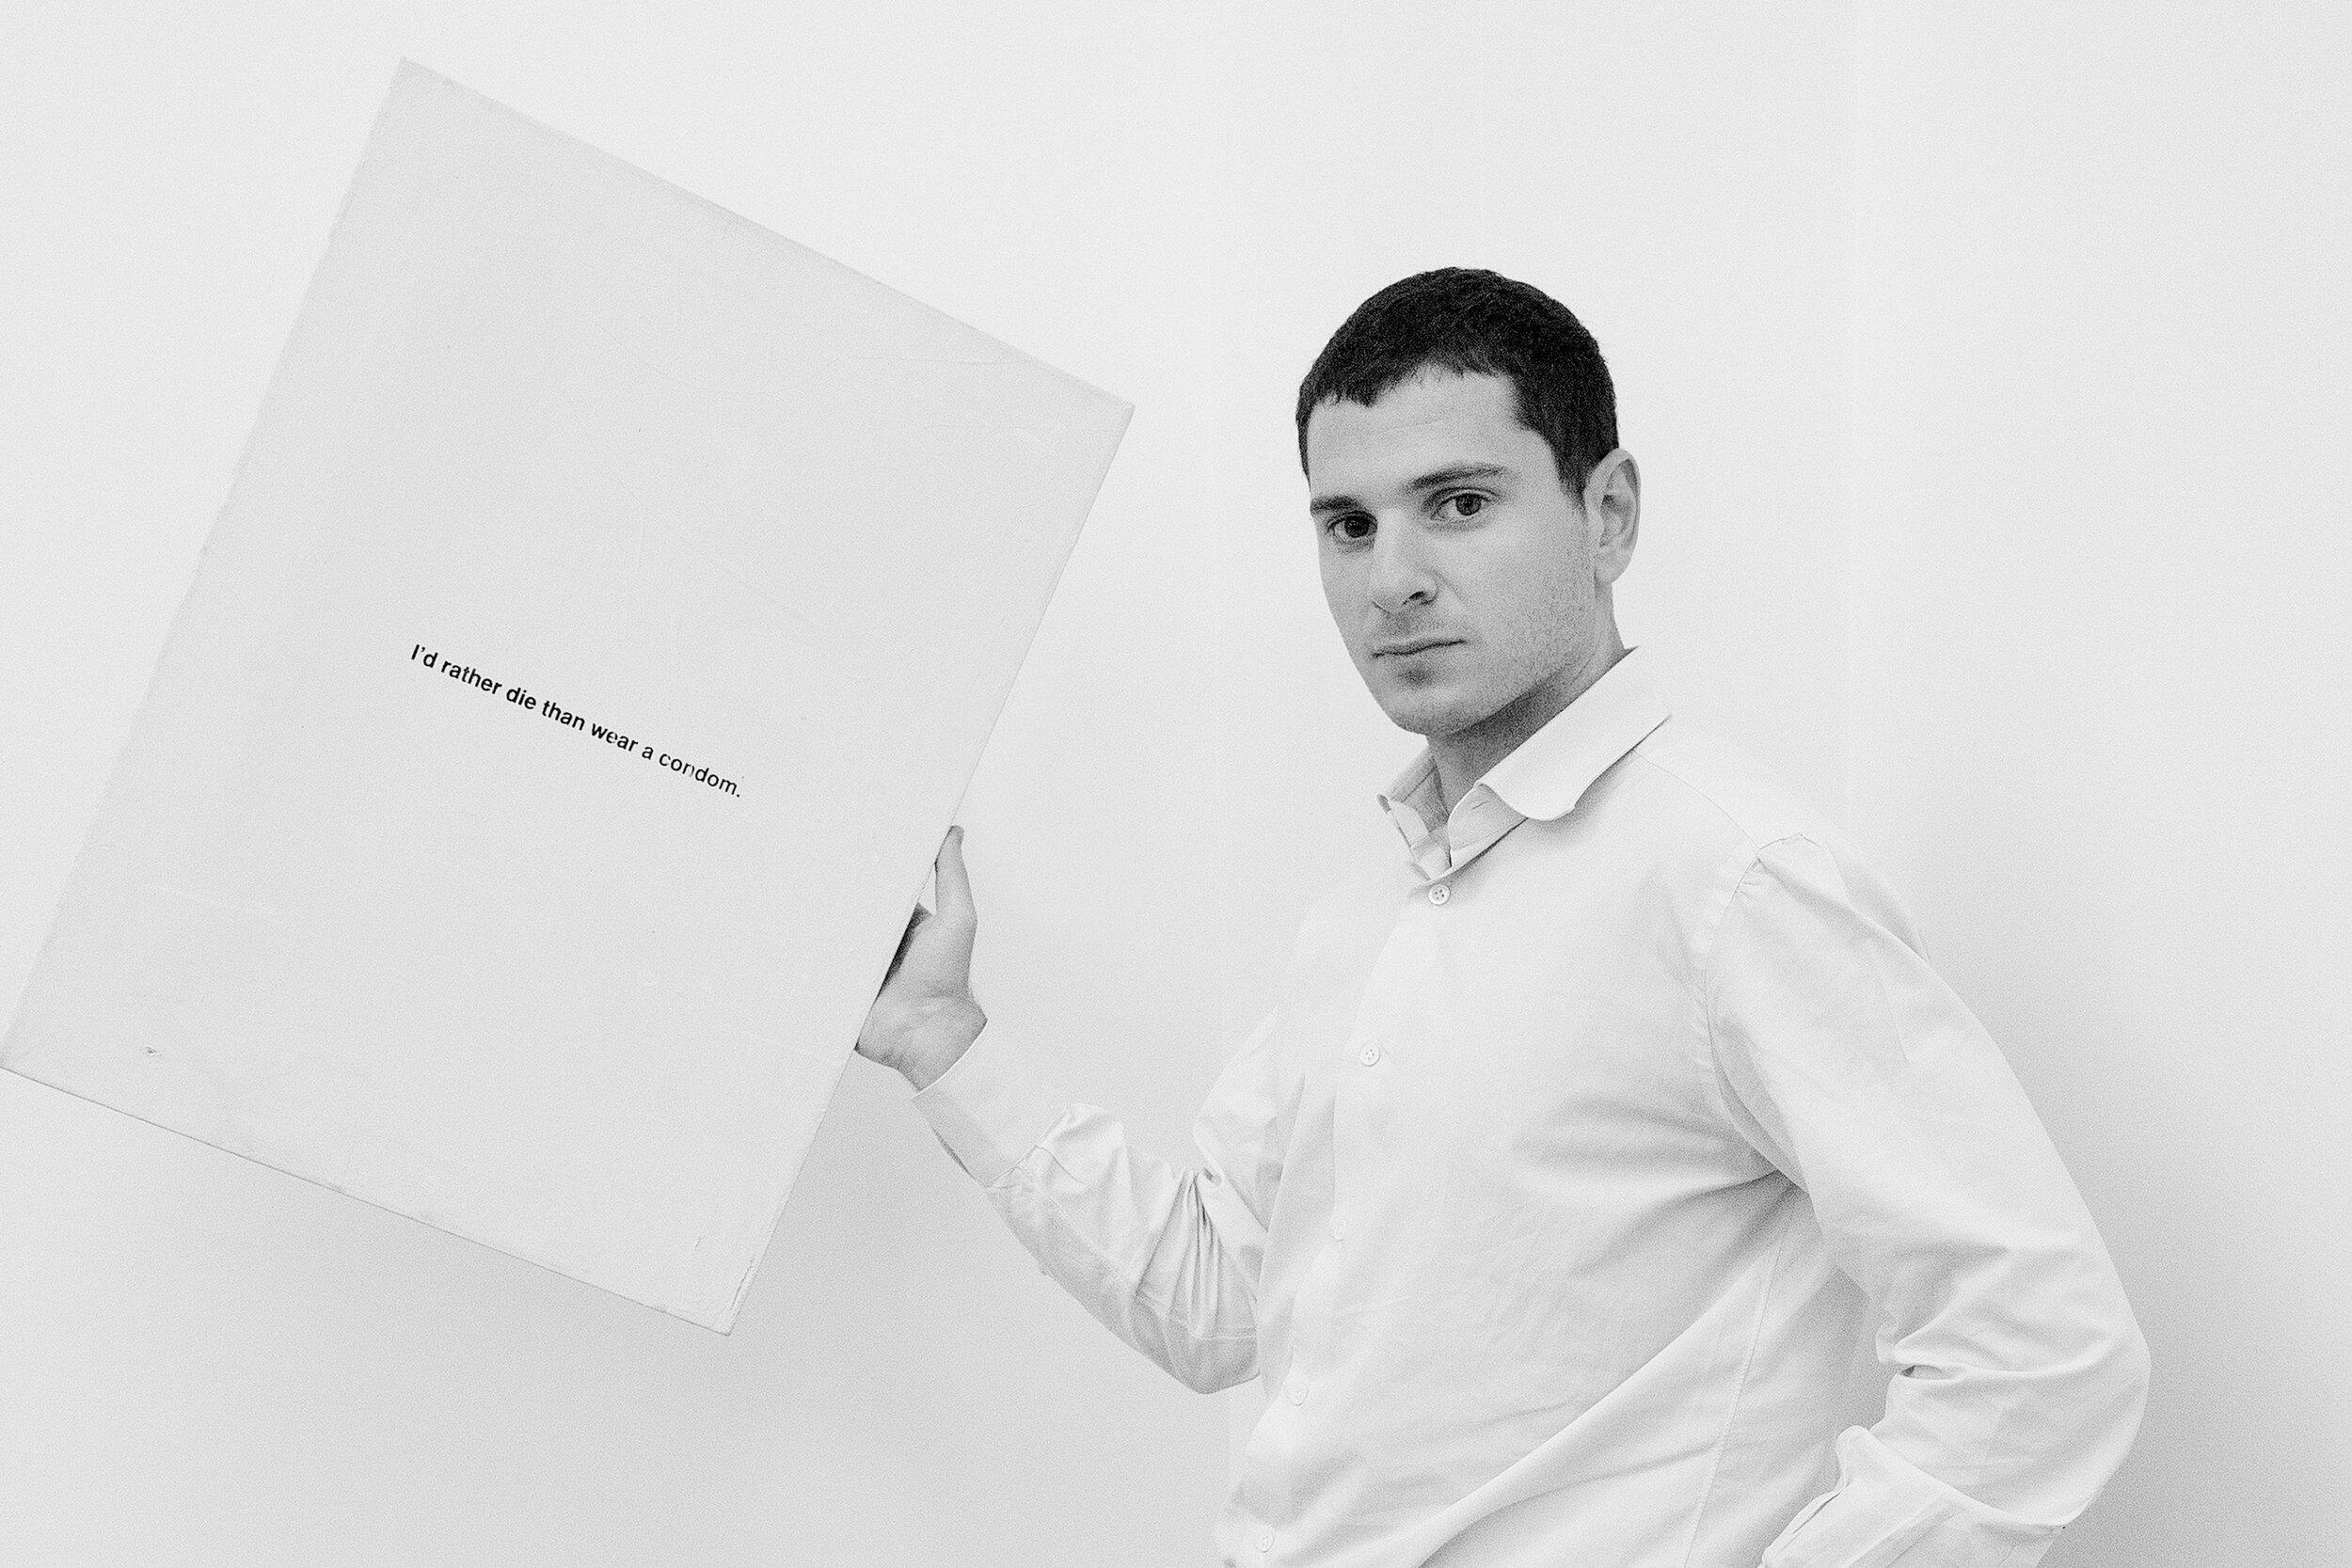 joe-joseph-nahmad-artist-new-york-guillaume-ziccarelli-01.jpg